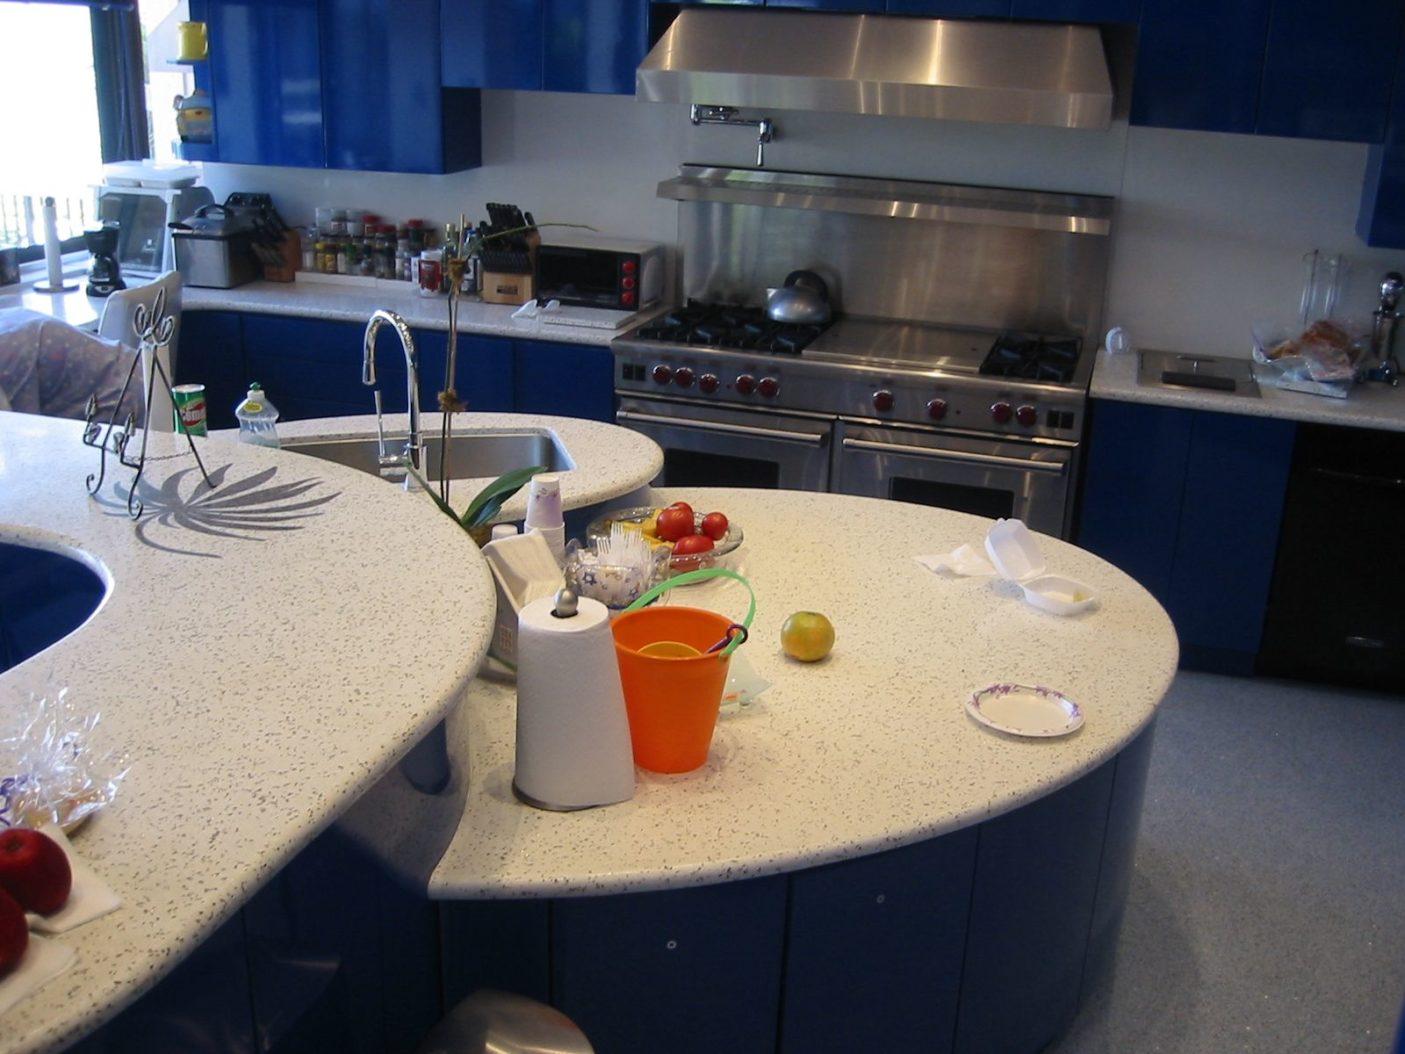 Kitchens-182.jpg